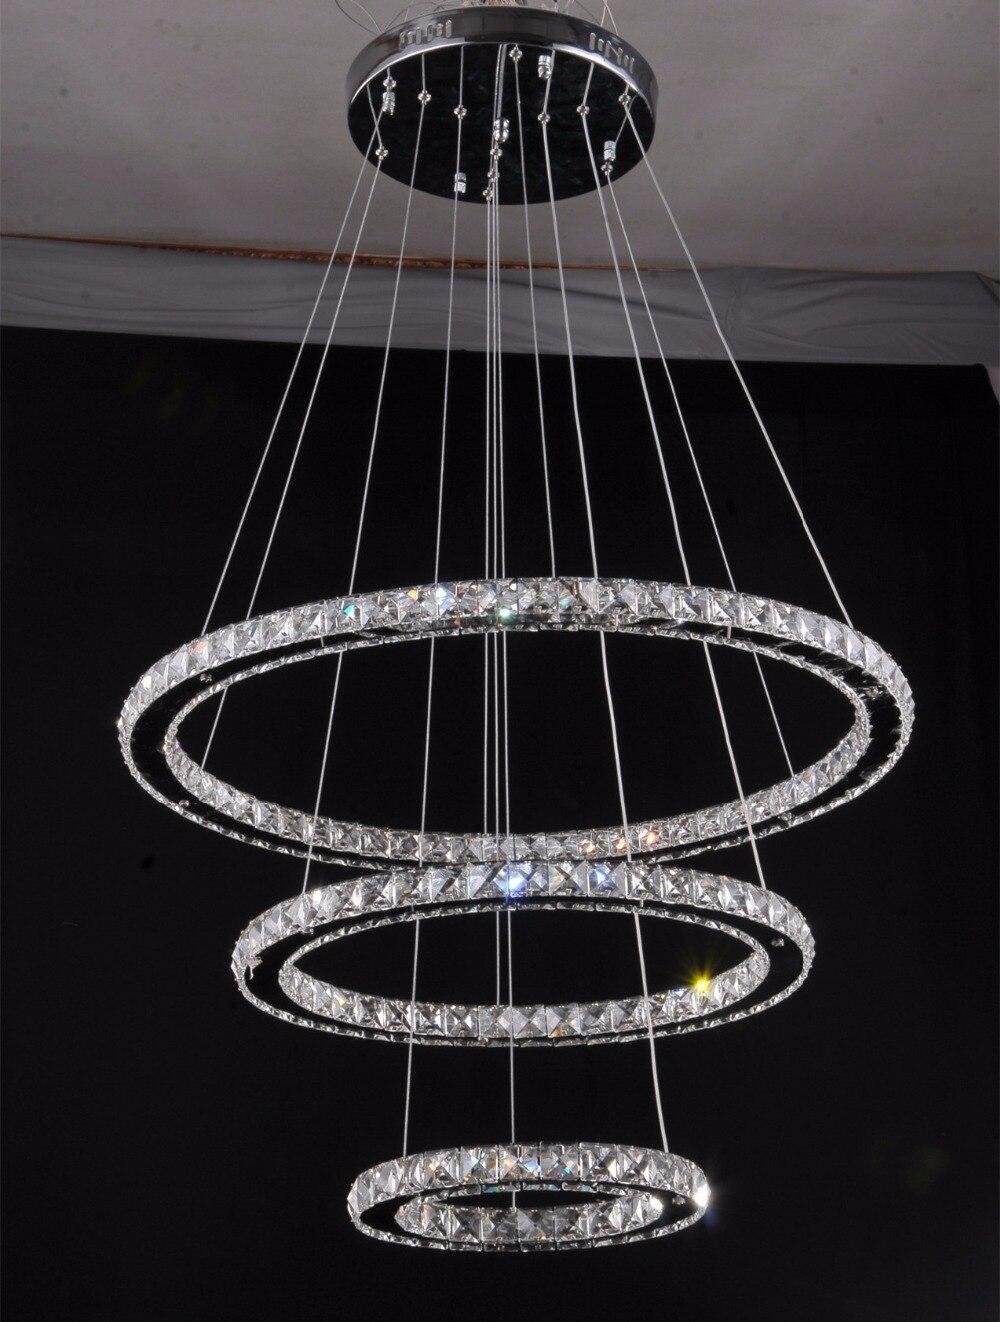 Modern rope light lustres led crystal pendant lamps light luxury modern 3 ring luxury chandelier hot sale led crystal chandelier light lustres de cristal circles ceiling lamp white light parisarafo Choice Image